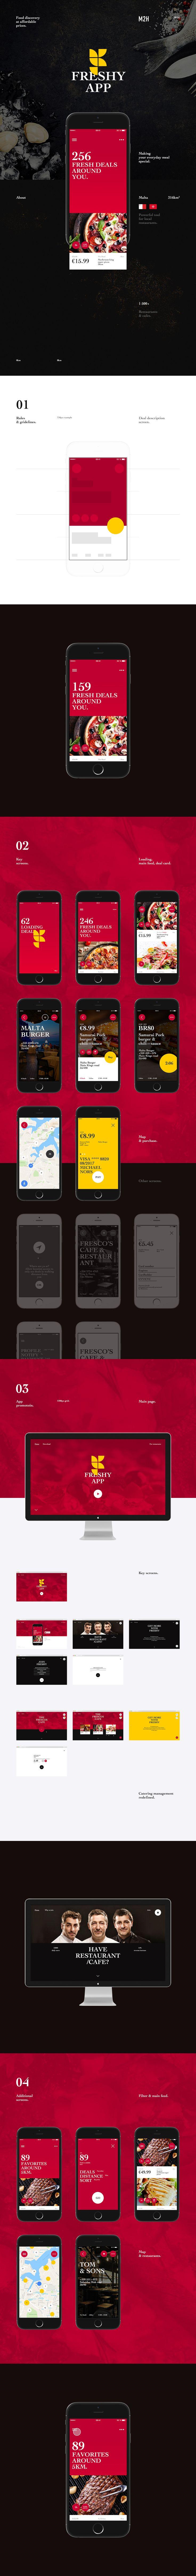 Freshy App, Интерфейс © АлександрЛагута